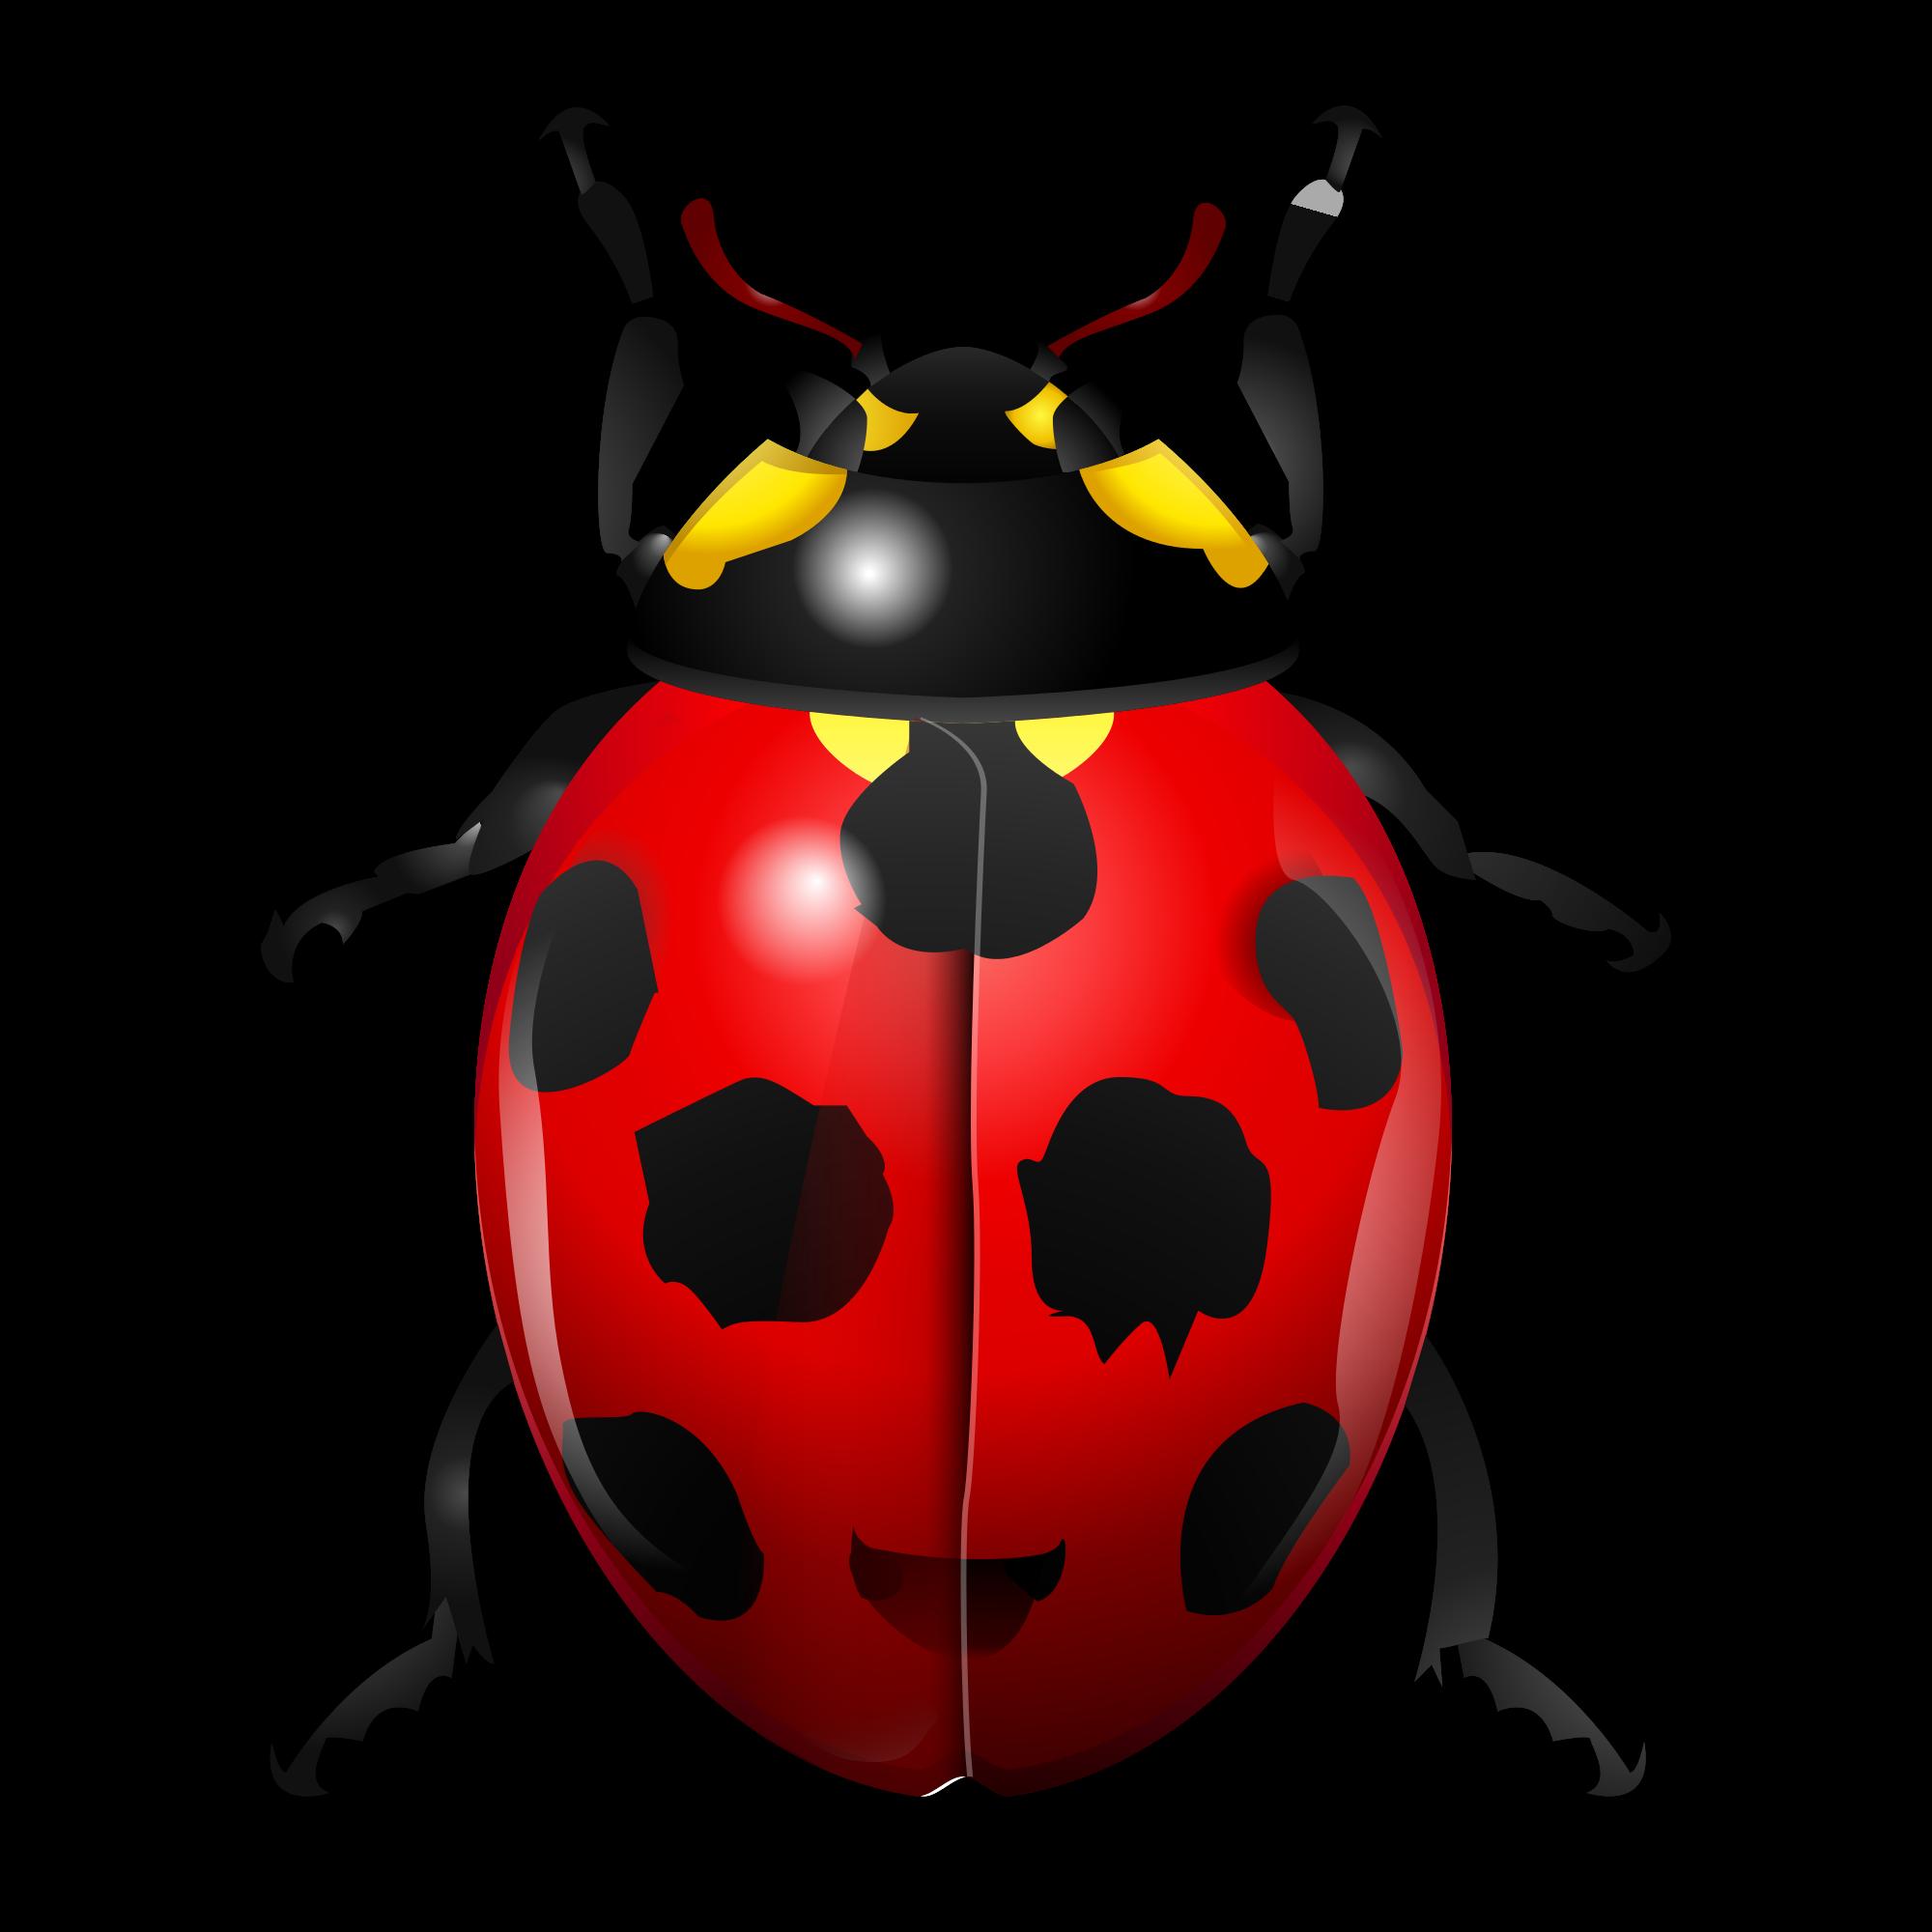 File oxygen kbugbuster svg. Ladybug clipart symmetrical